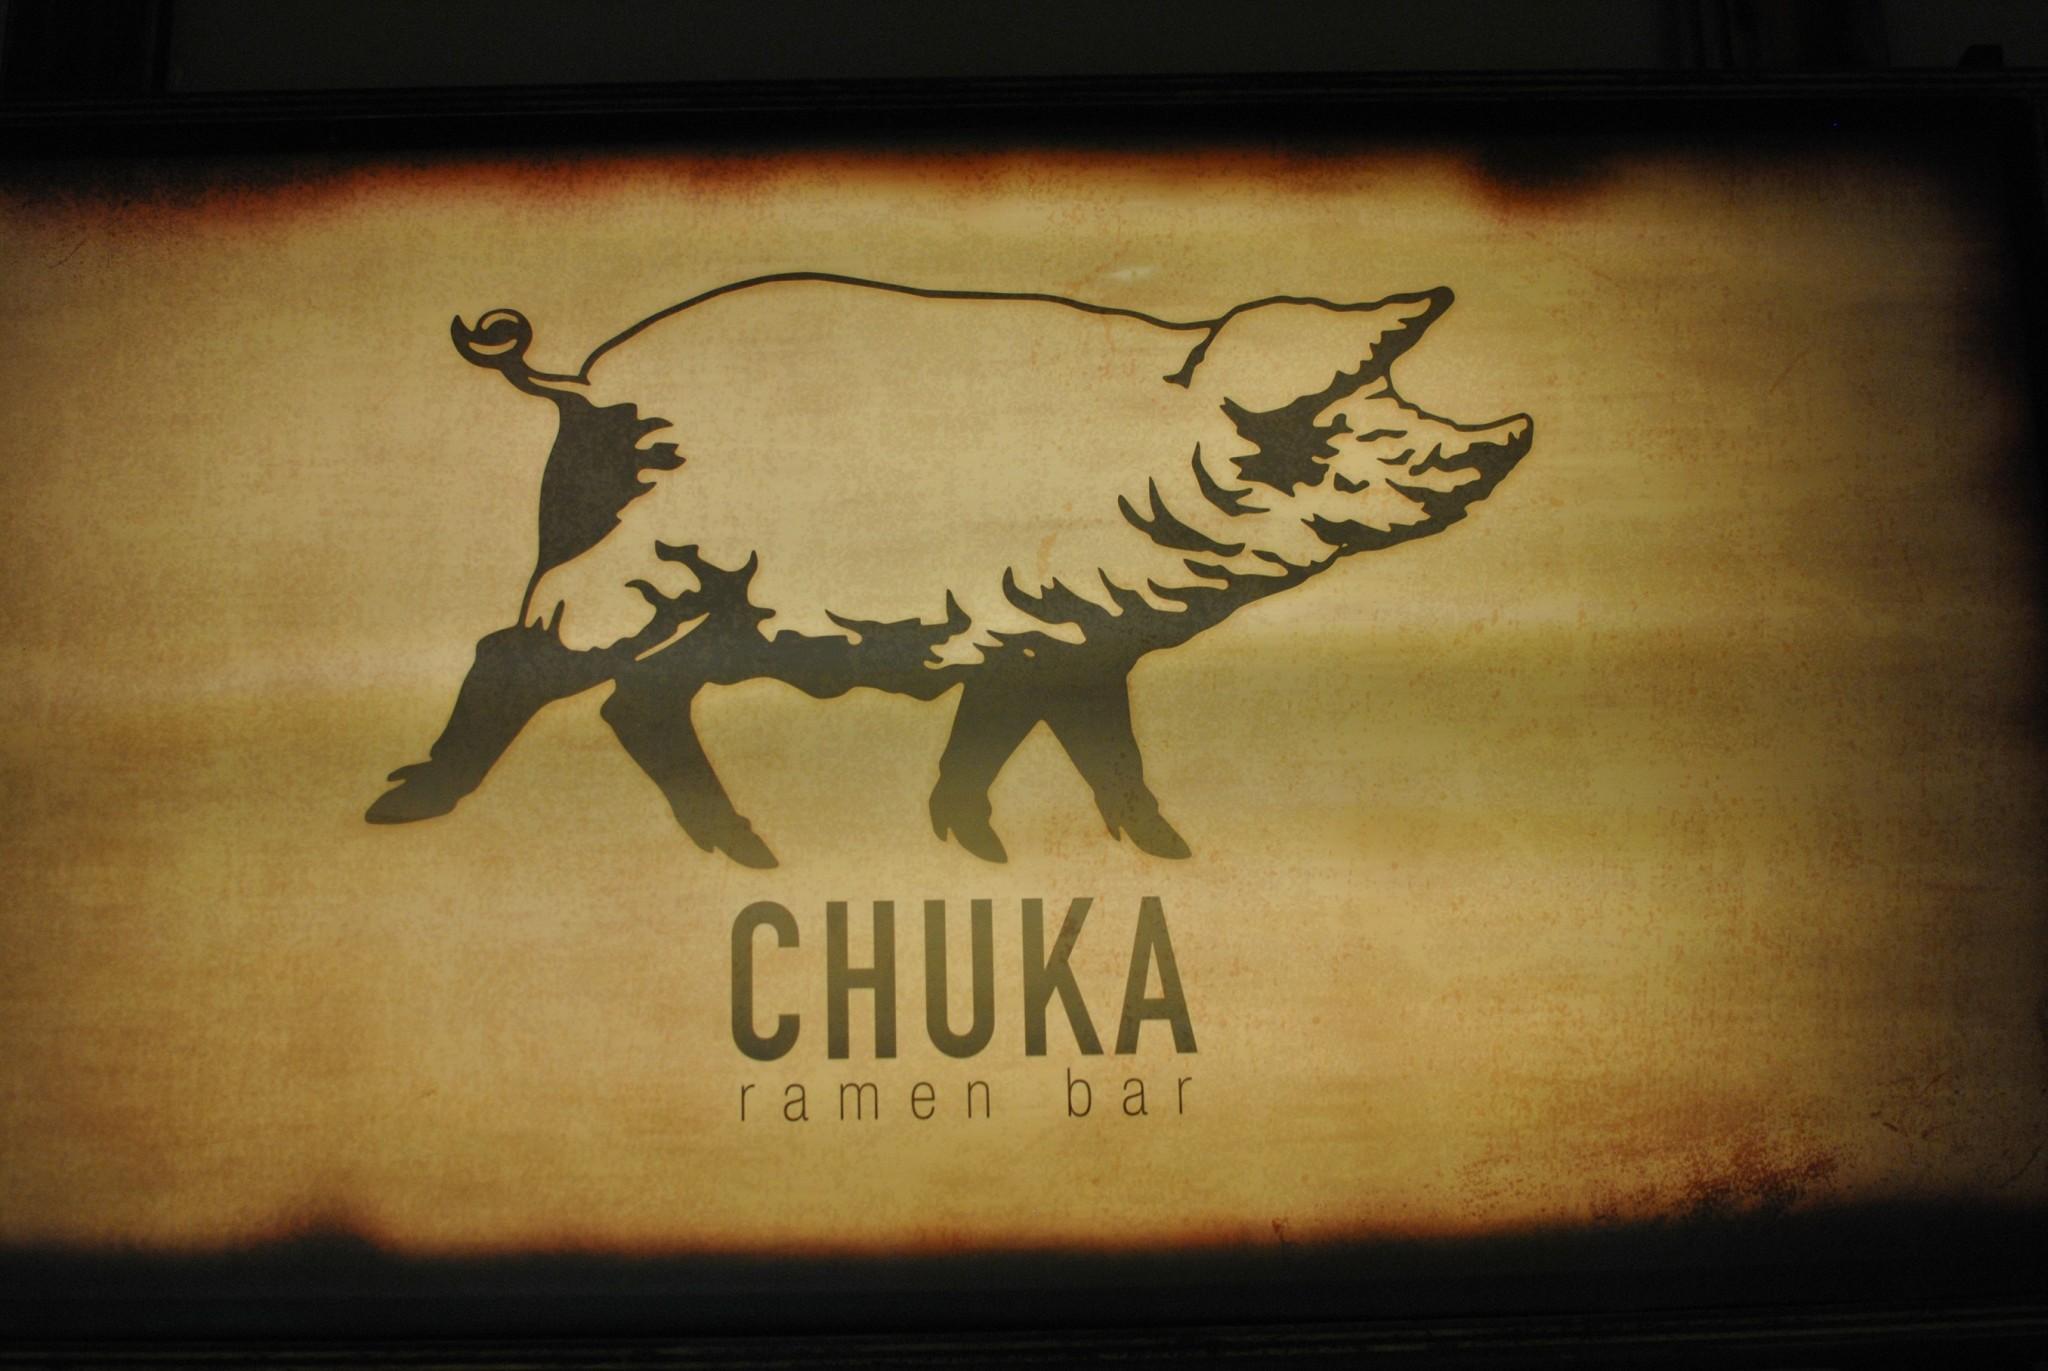 Chuka_chuka